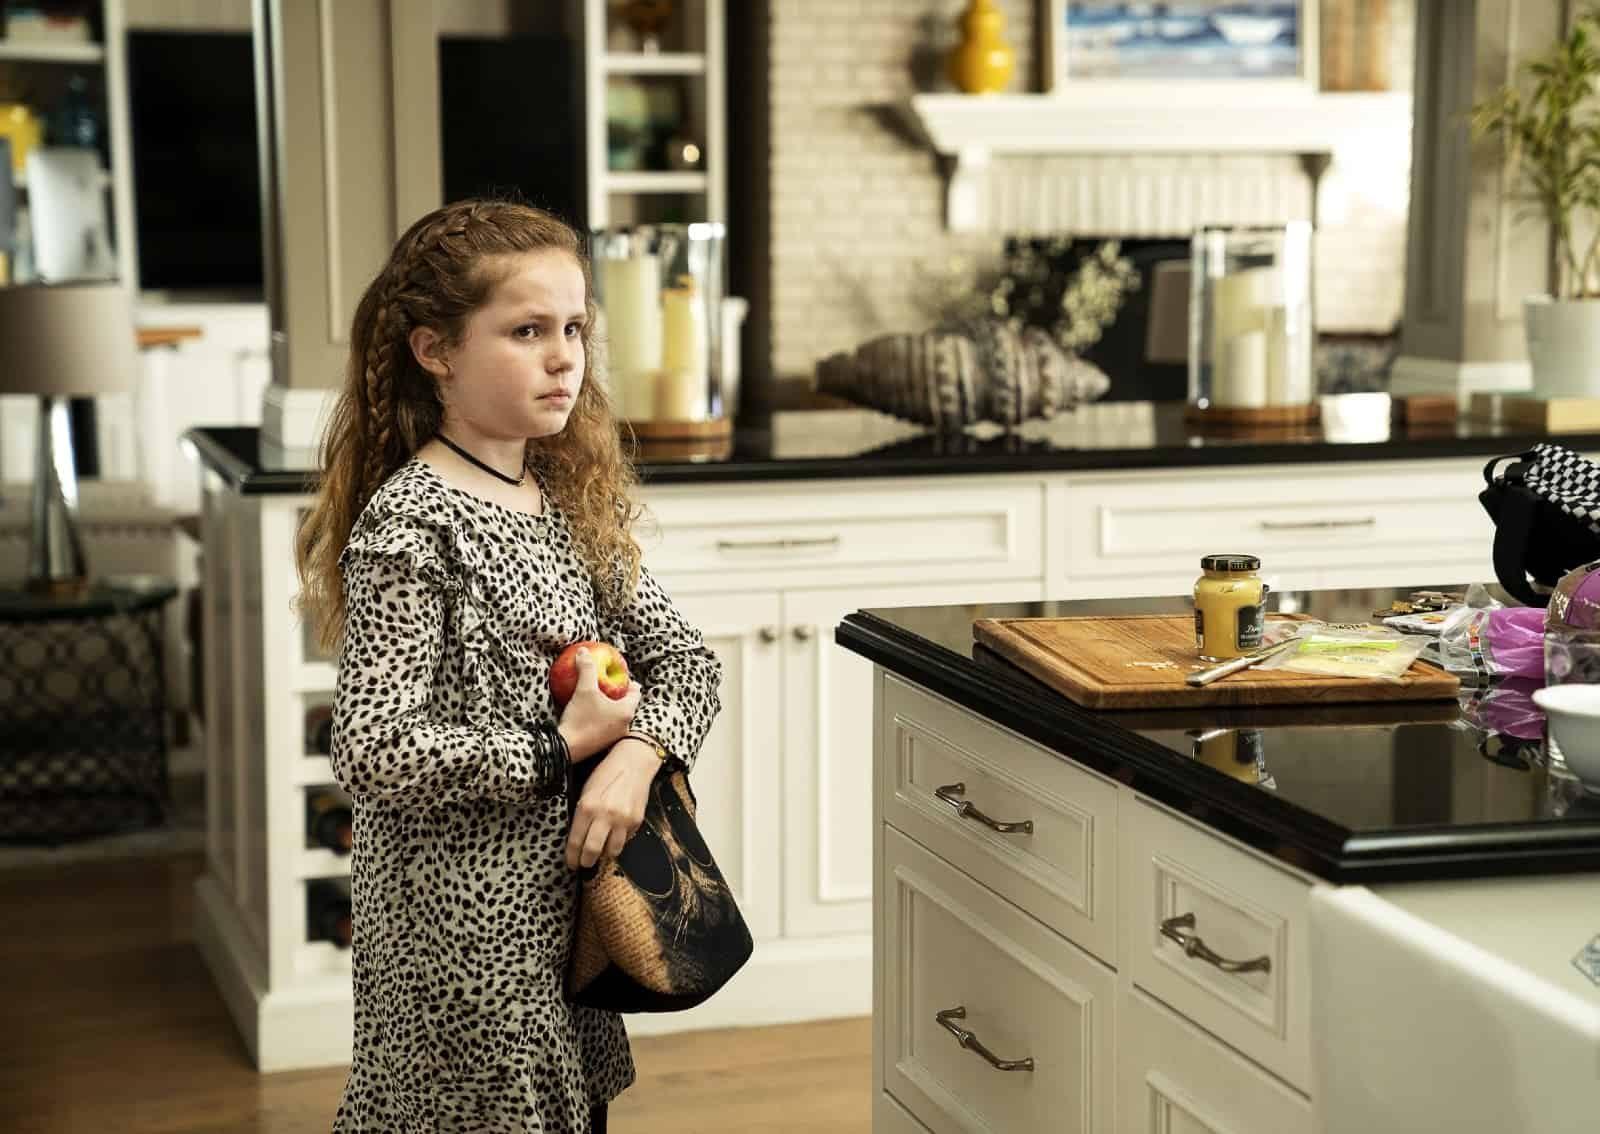 Darby Camp como Chloe Mackenzie en Big Little Lies S02E07